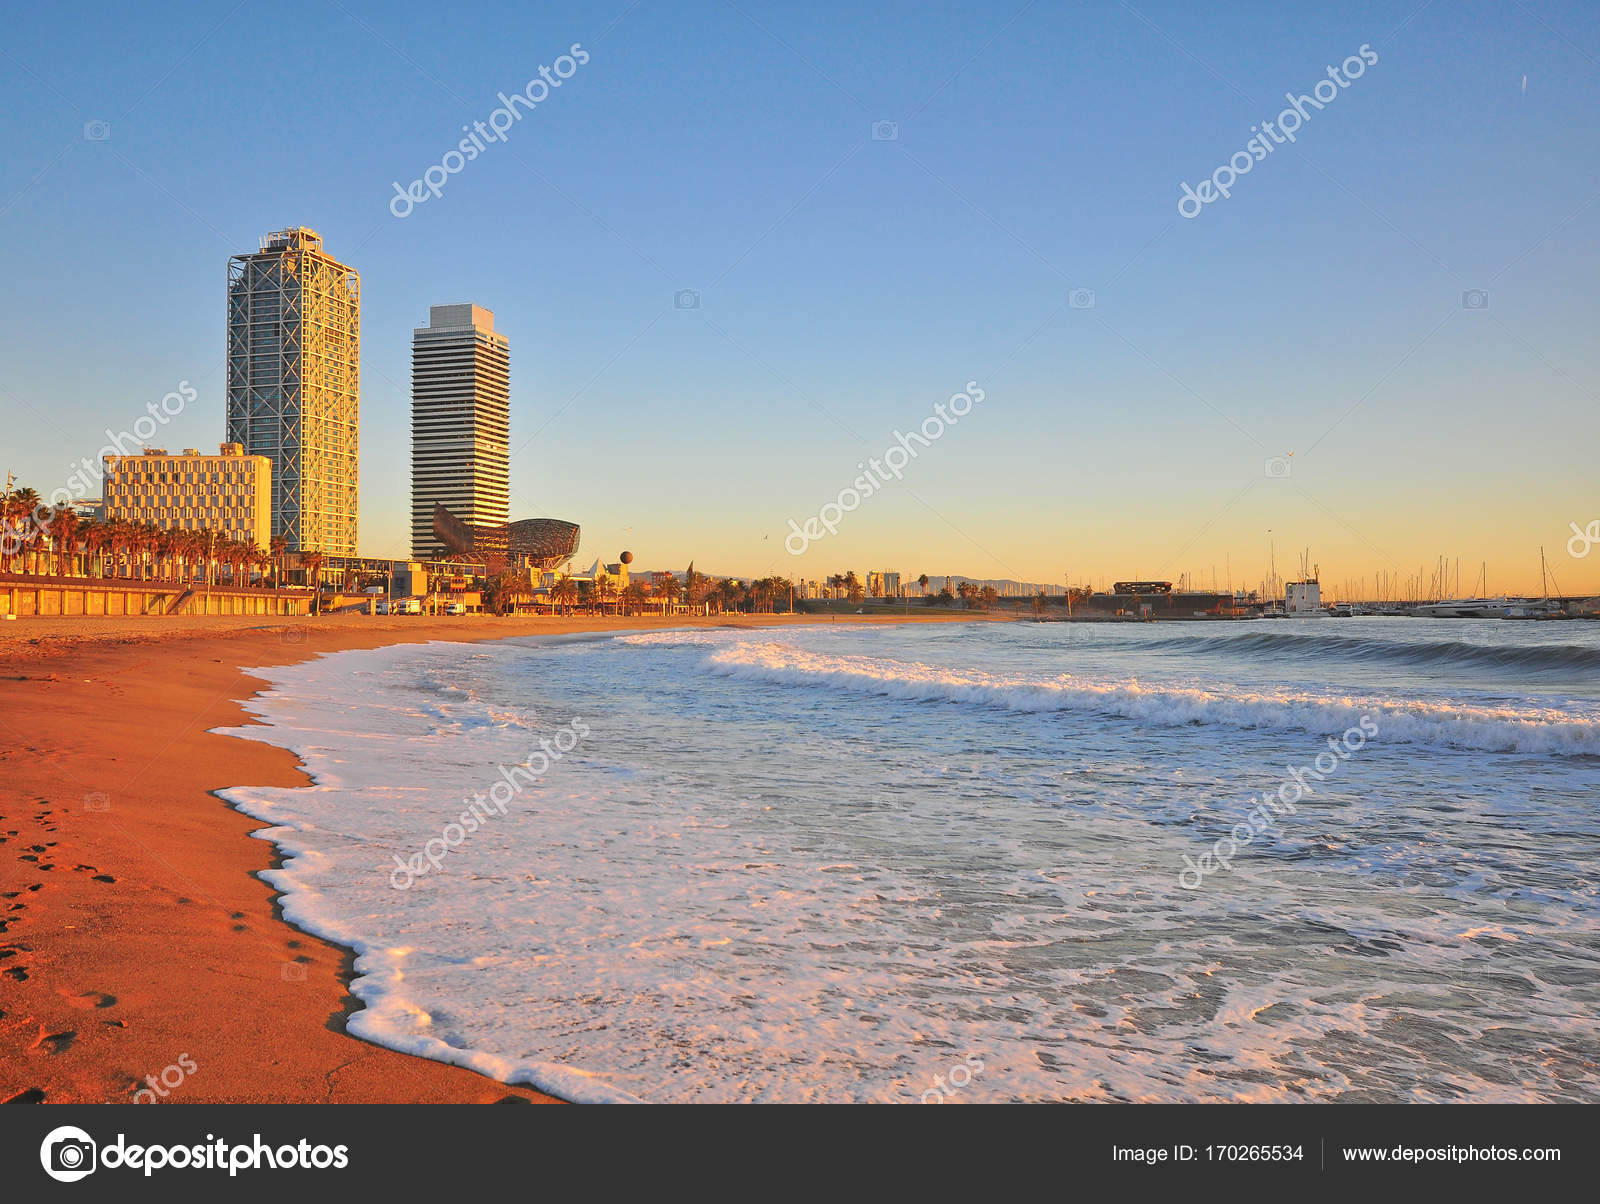 Strand Von Barcelona Auf Dem Sunset Stockfoto C Krasnevsky 170265534